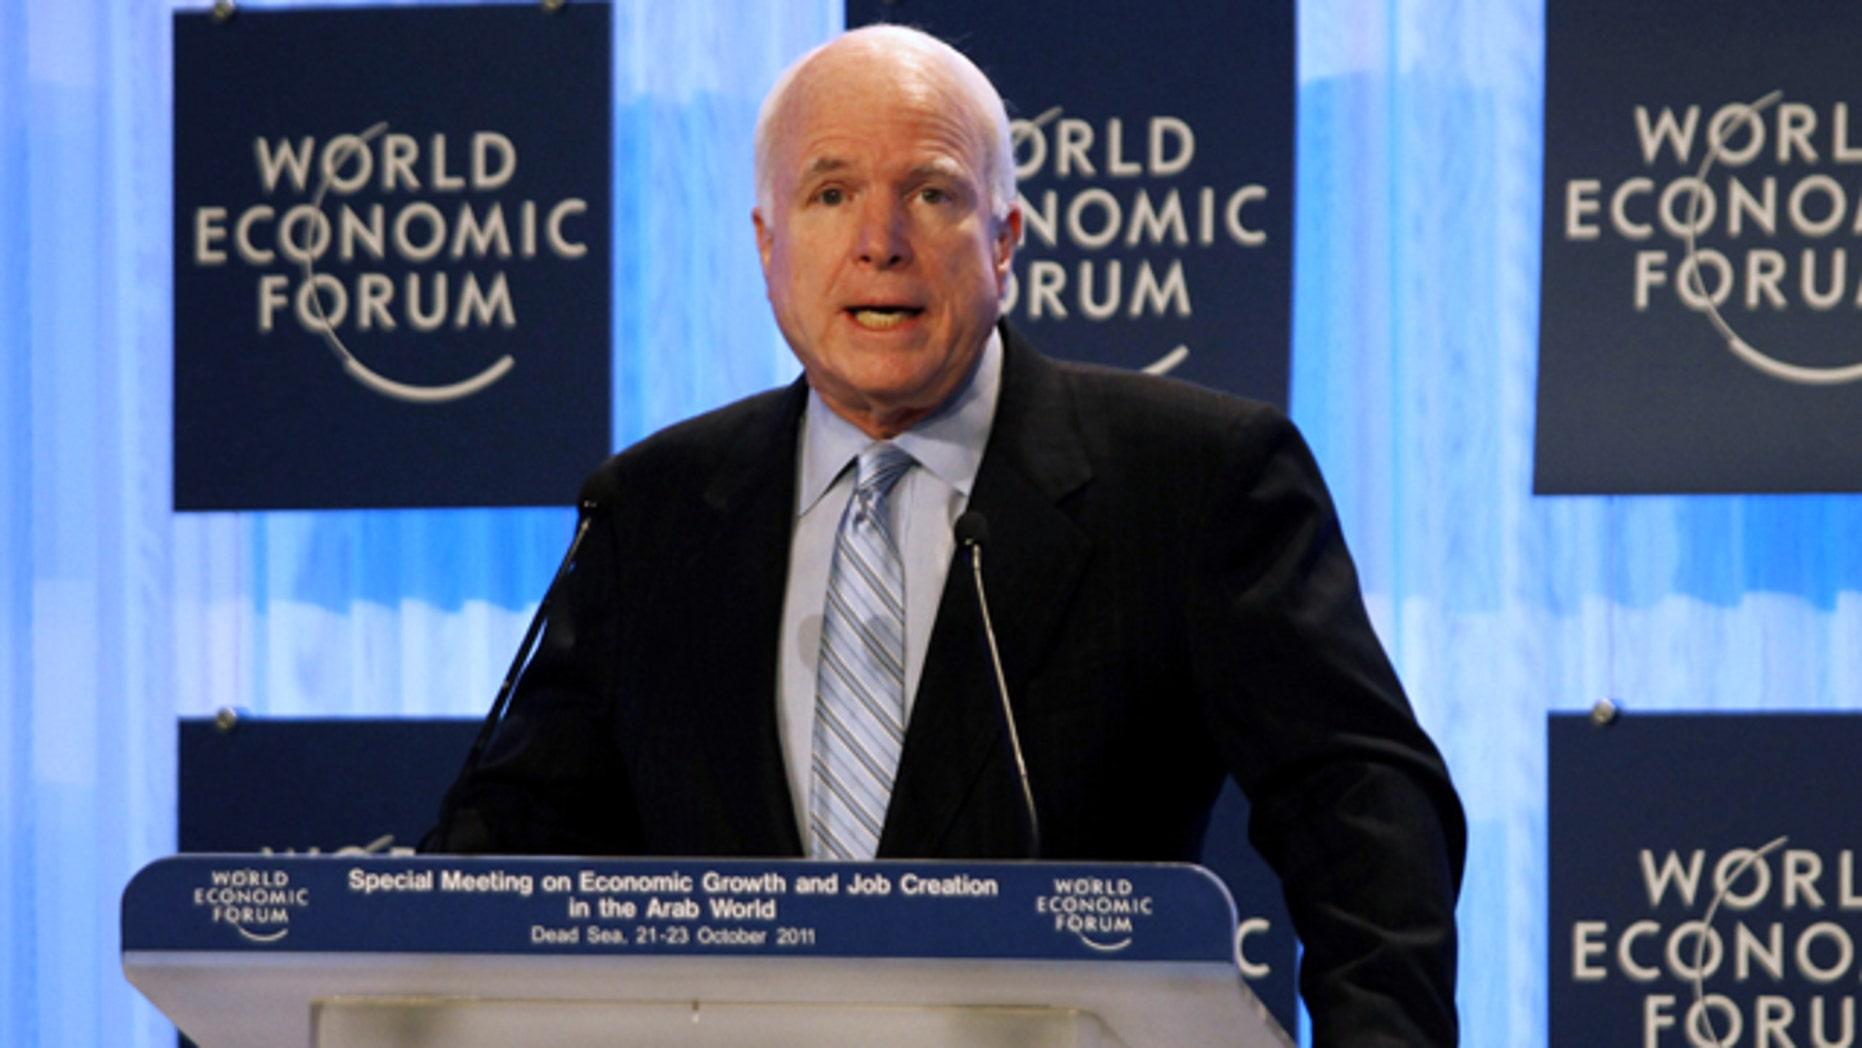 Oct. 23, 2011: U.S. Sen. John McCain speaks during the World Economic Forum meeting in the King Hussein Bin Talal convention center at the Dead Sea, 34 miles southeast of Amman, Jordan.